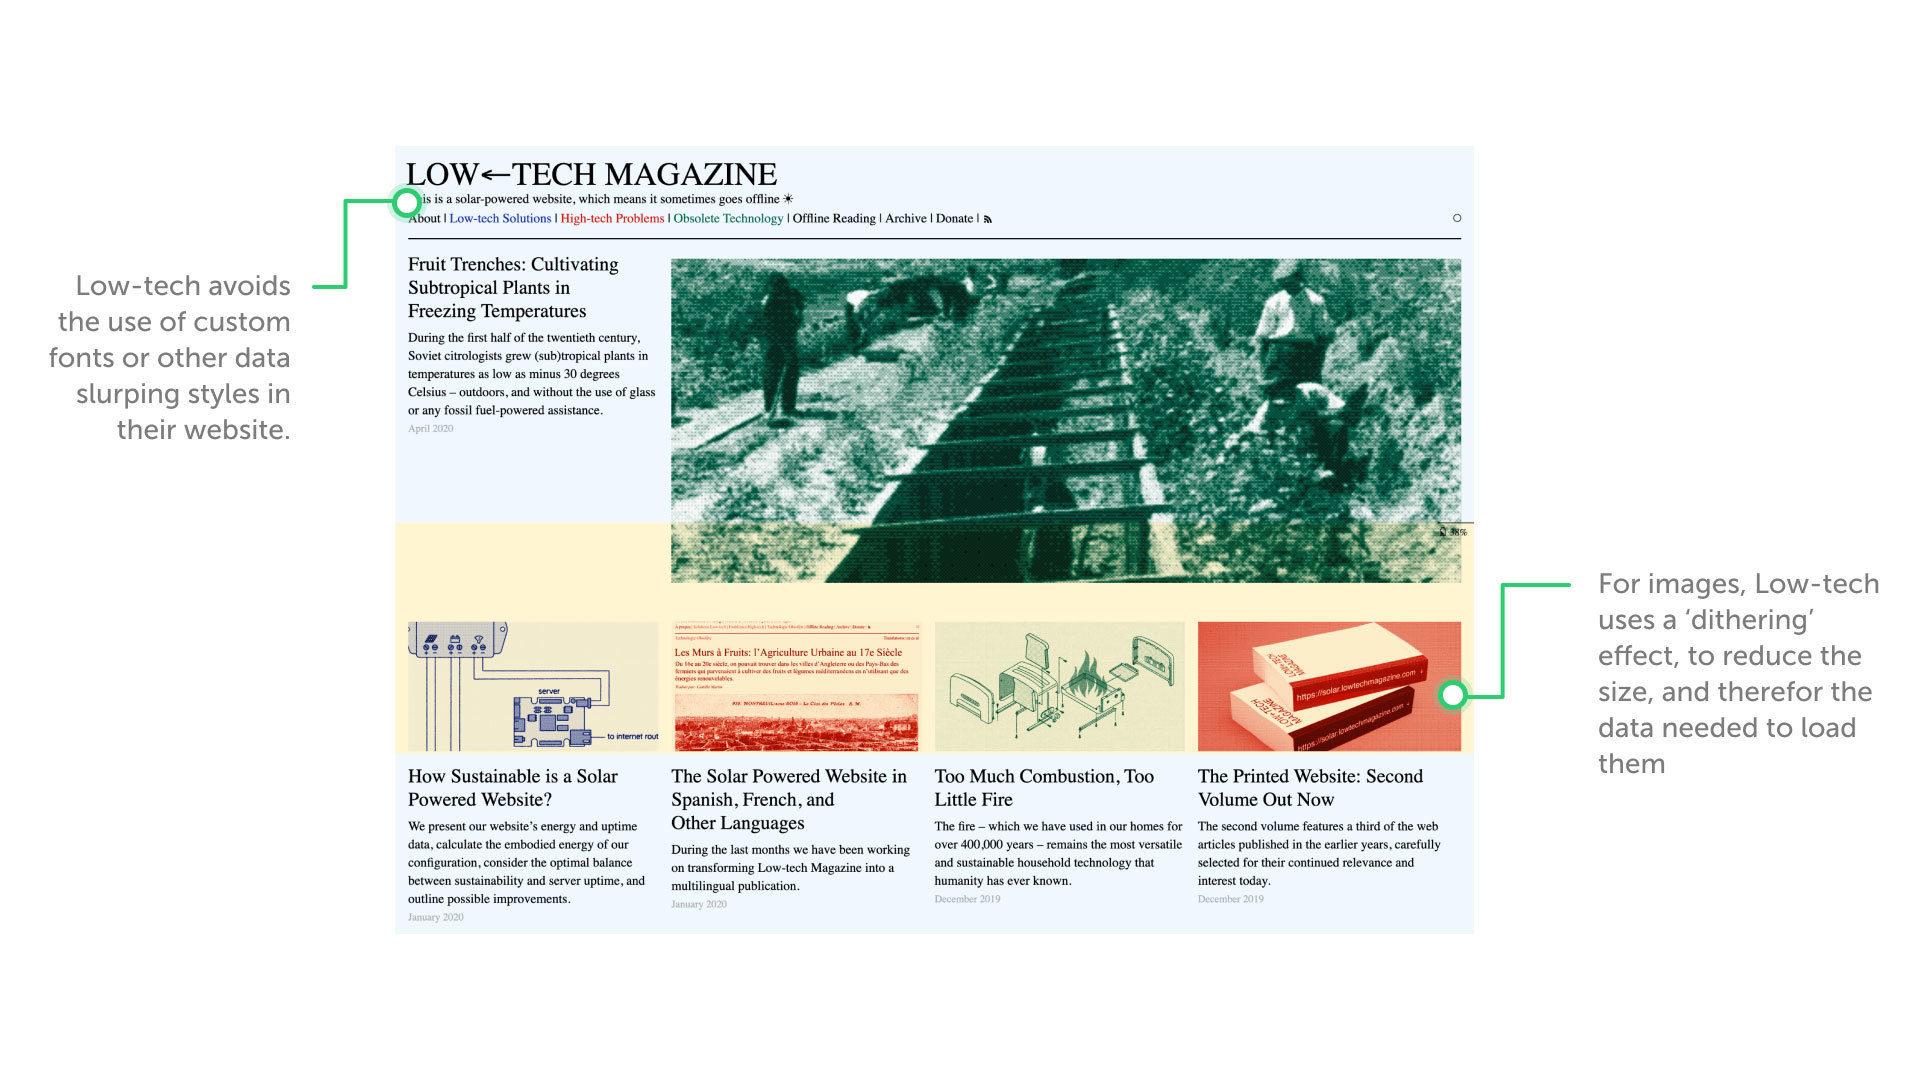 Low-tech Magazine's solar powered website